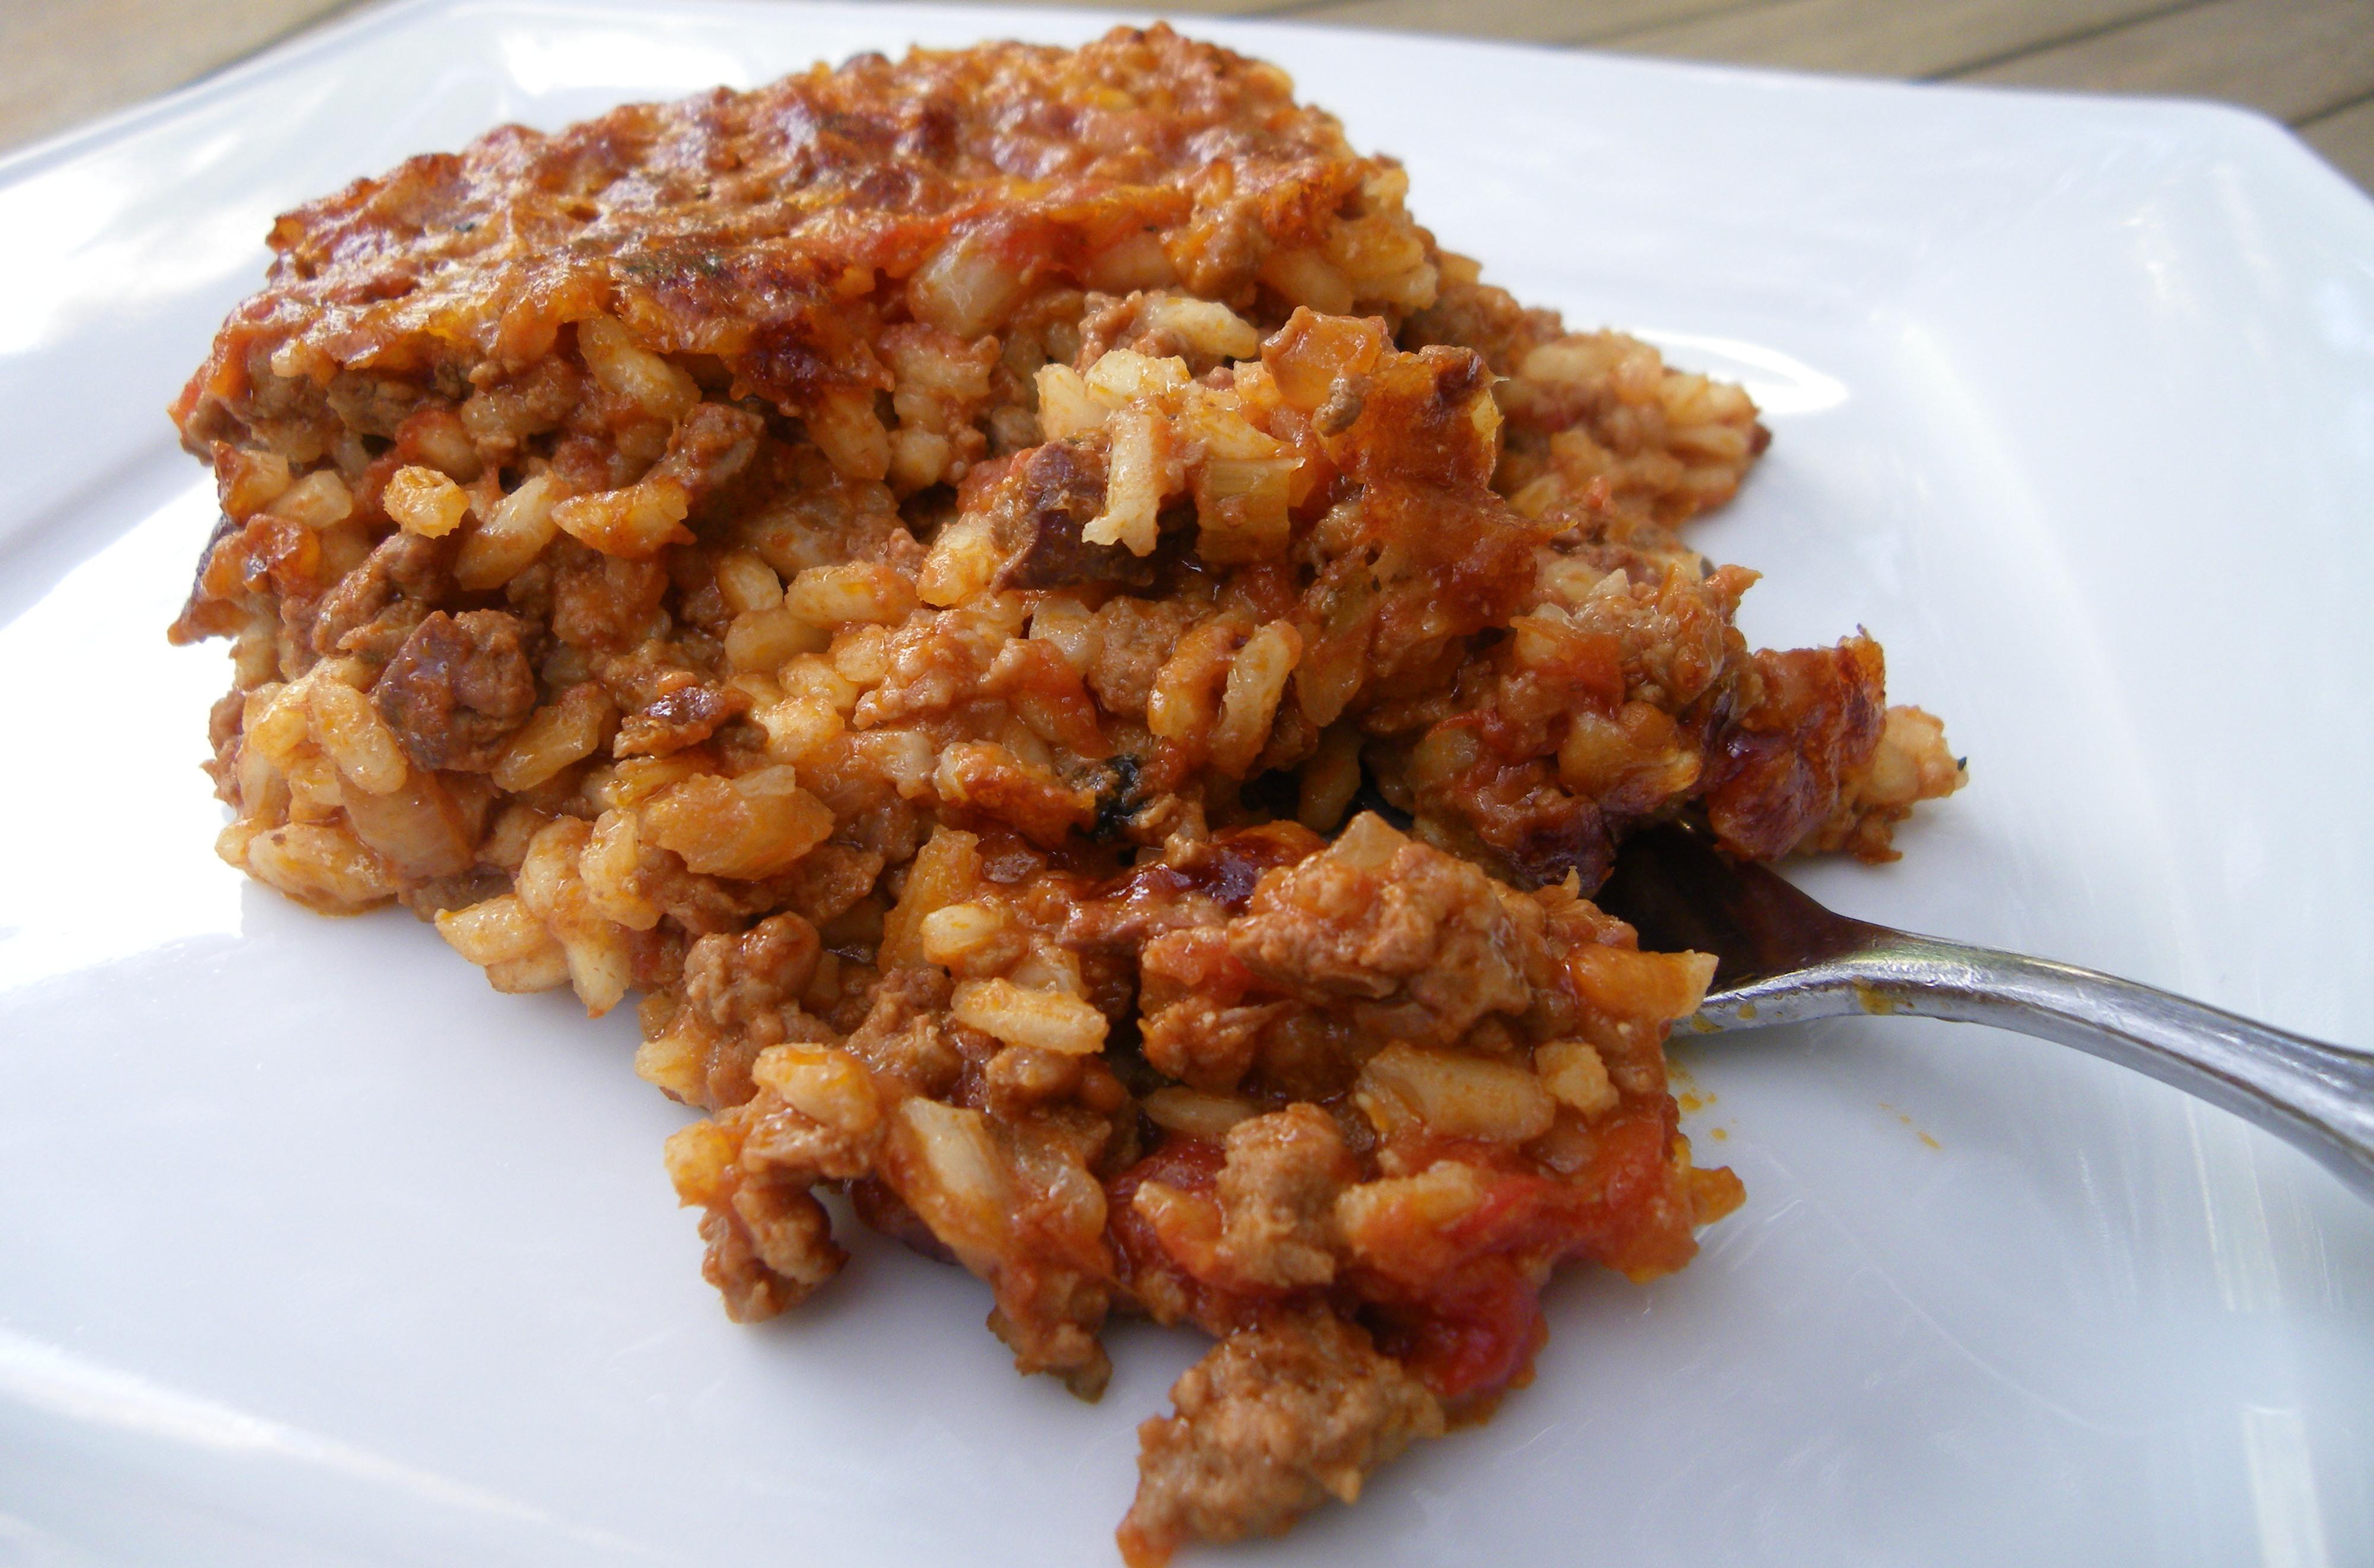 Baked carnaroli rice